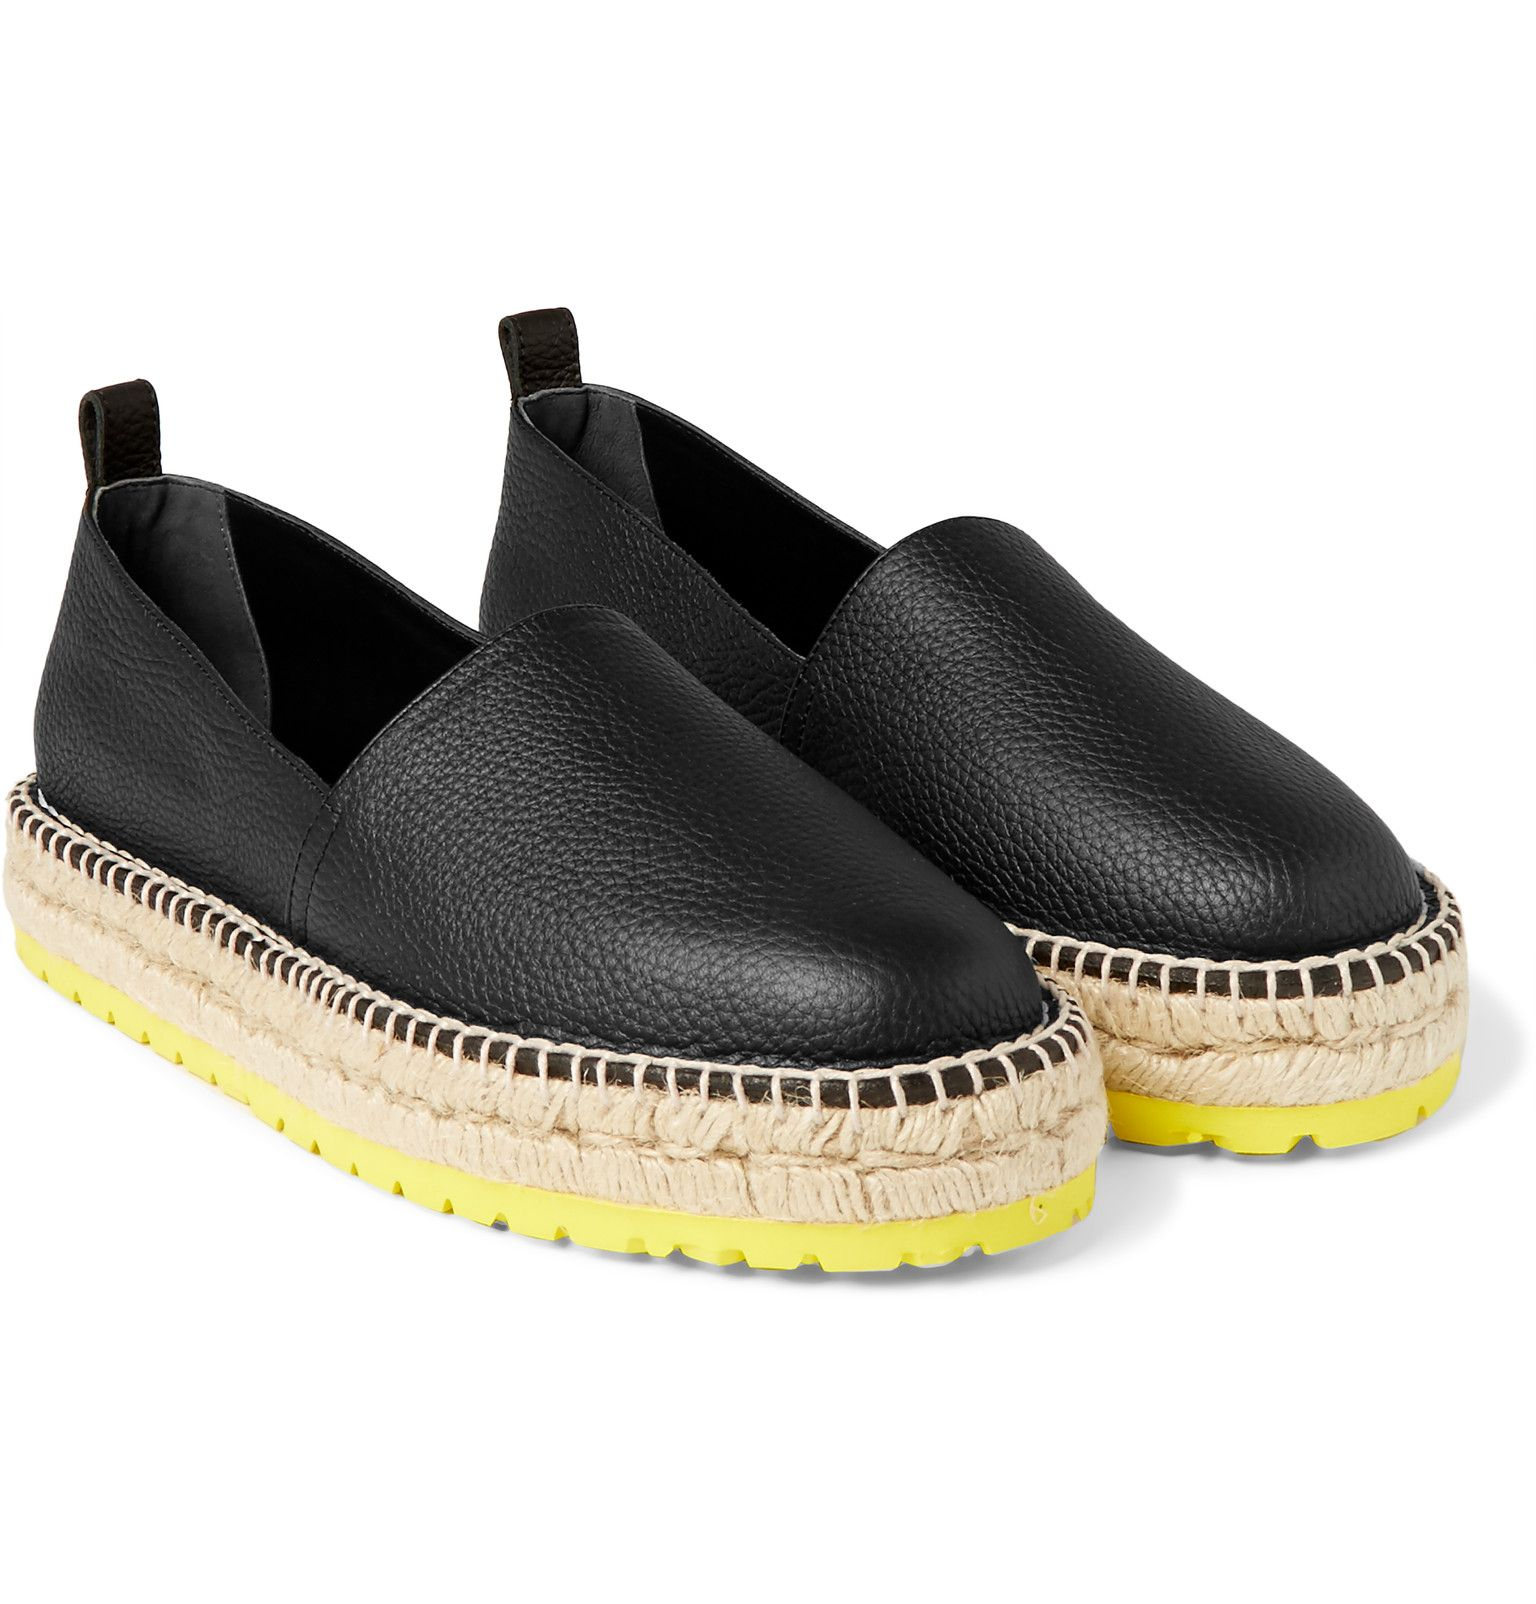 993e24321cd Balenciaga - Full-Grain Leather Espadrilles | My Style | Leather ...